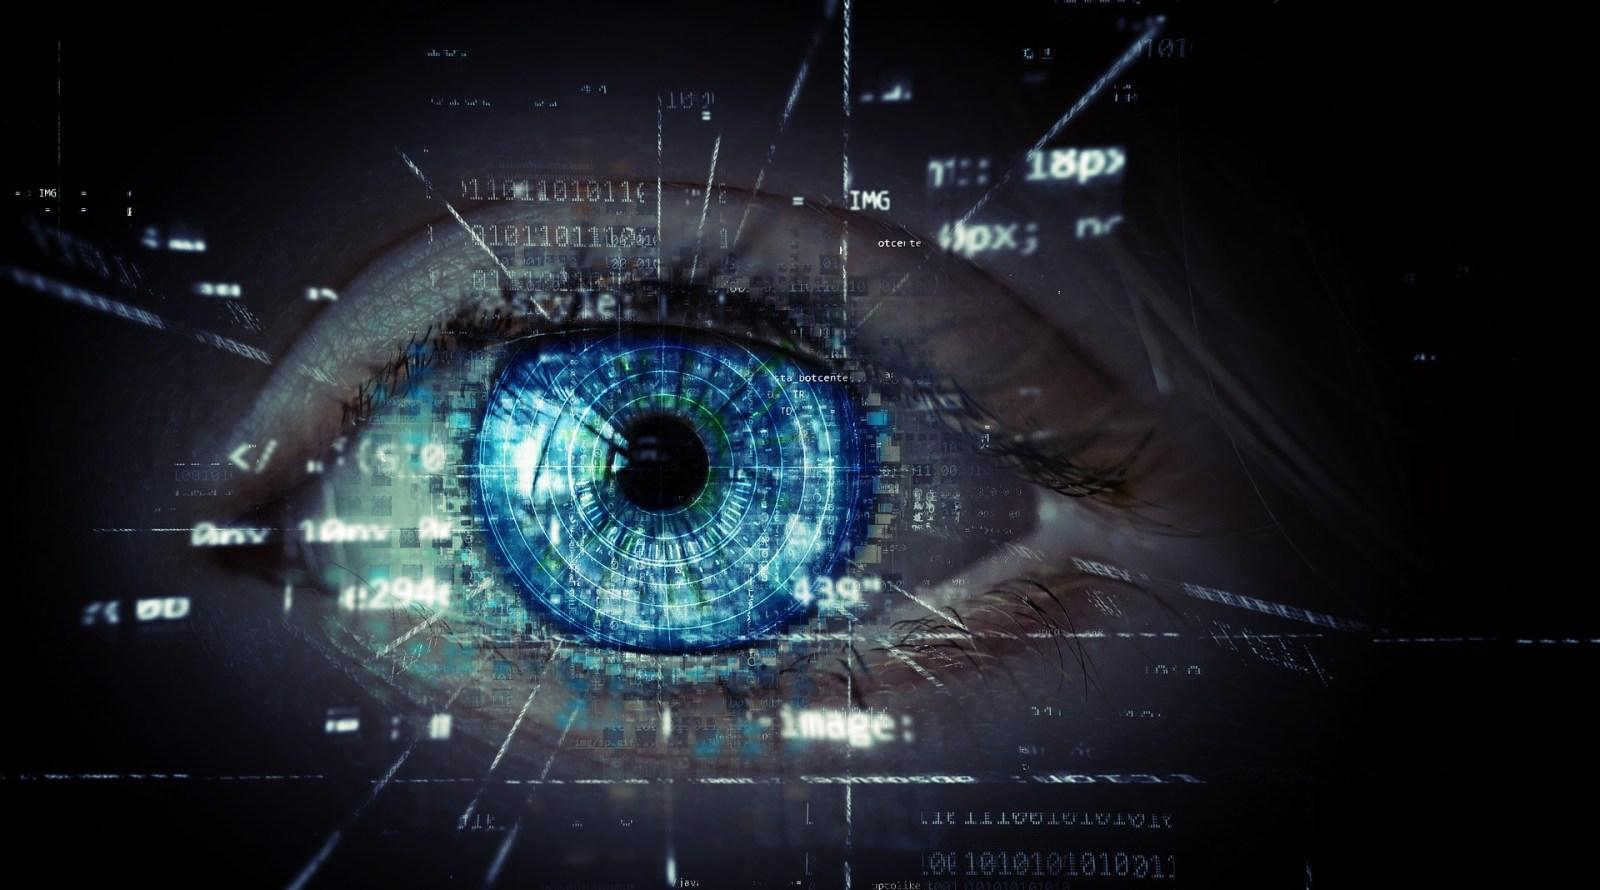 1-15 April 2020 Cyber Attacks Timeline